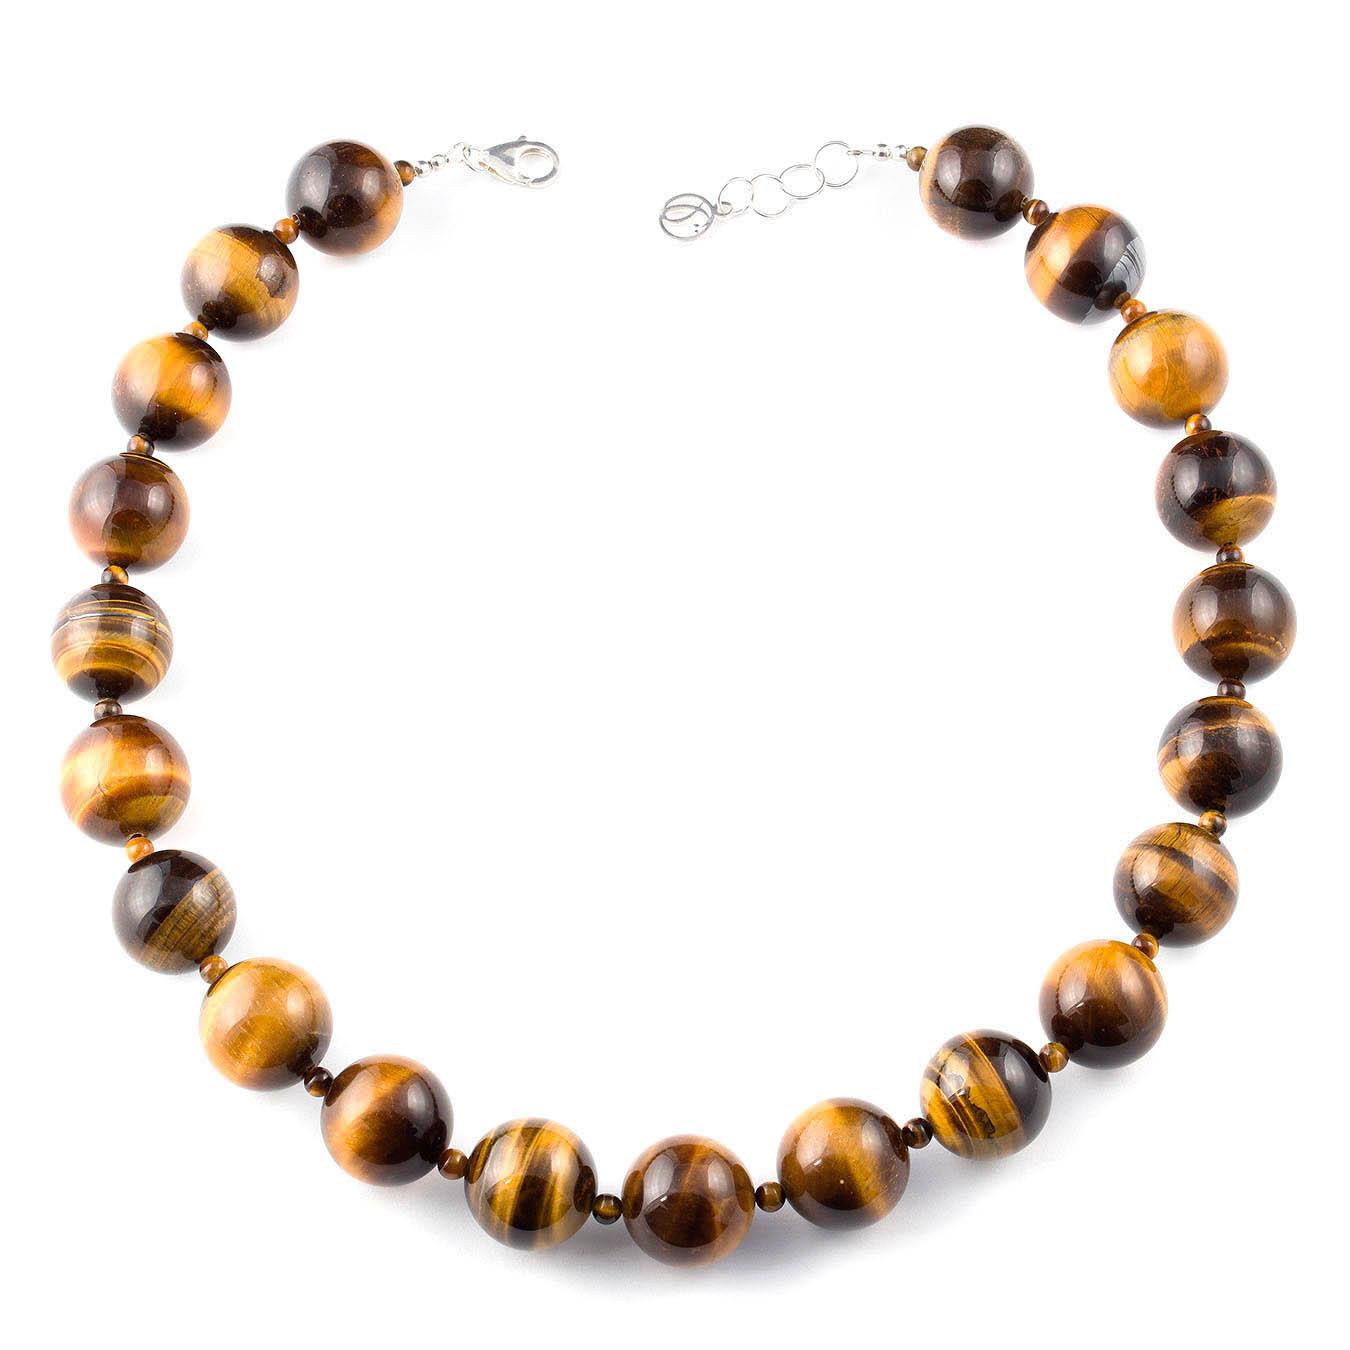 Handmade bold jewelry necklace made with tiger eye gemstone beads